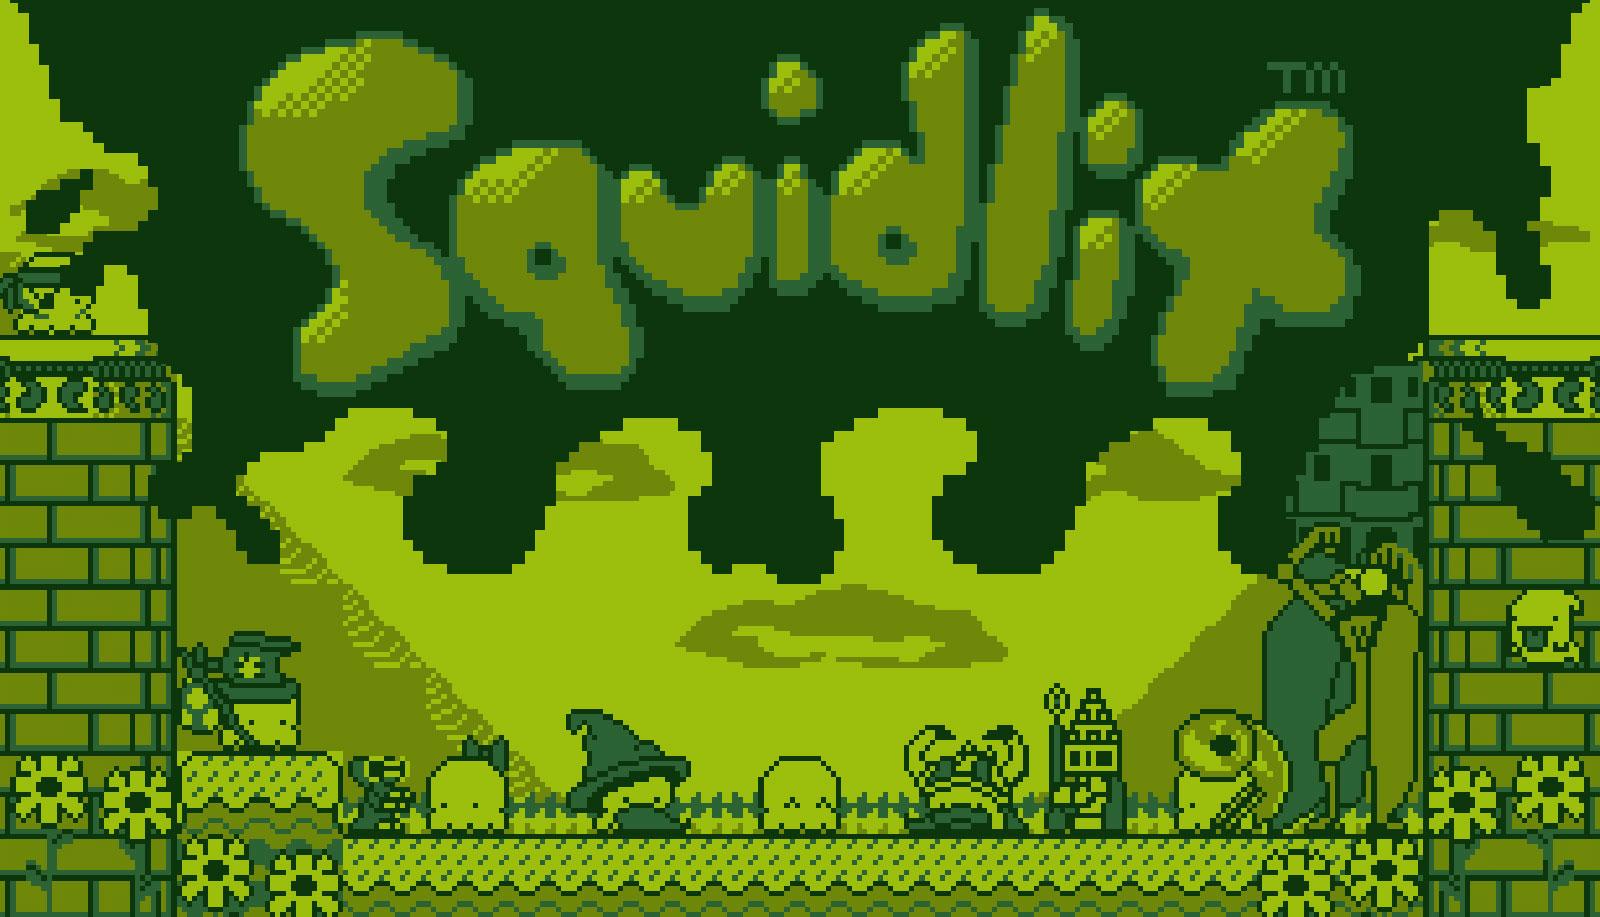 squidlit.jpg